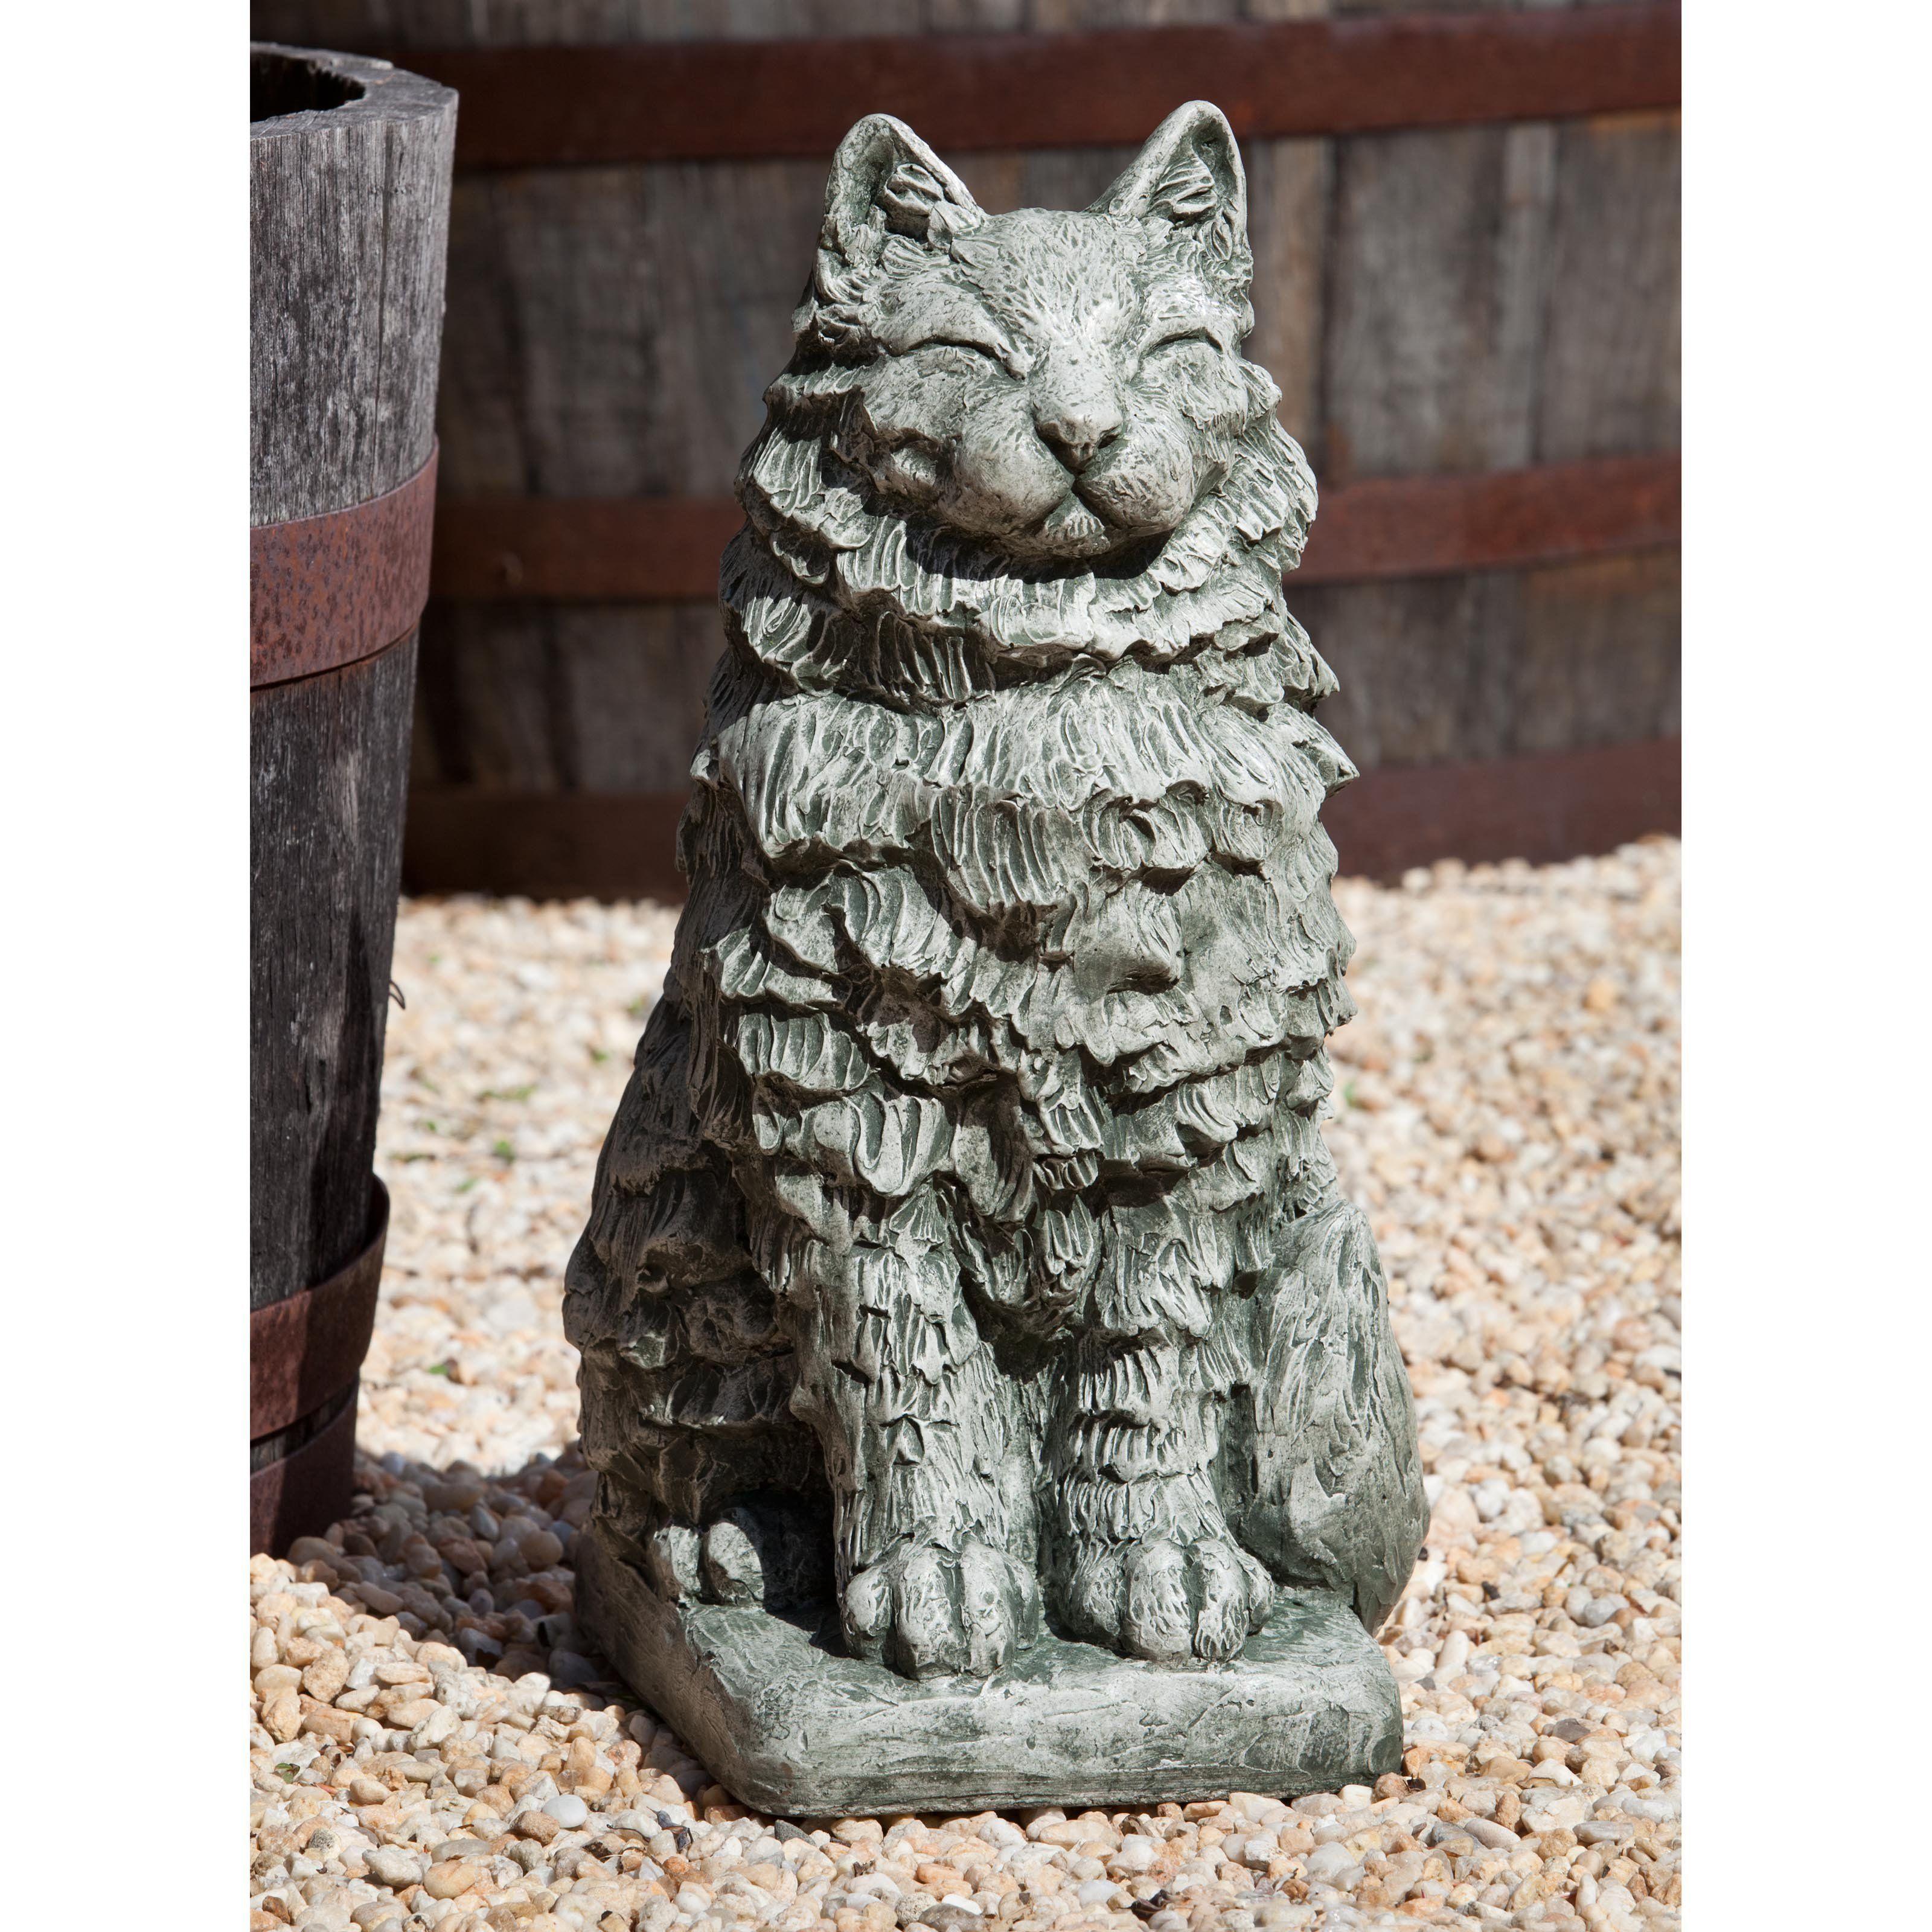 statue dahms lewis garden to a sculpture britta blog the dylan cat visit